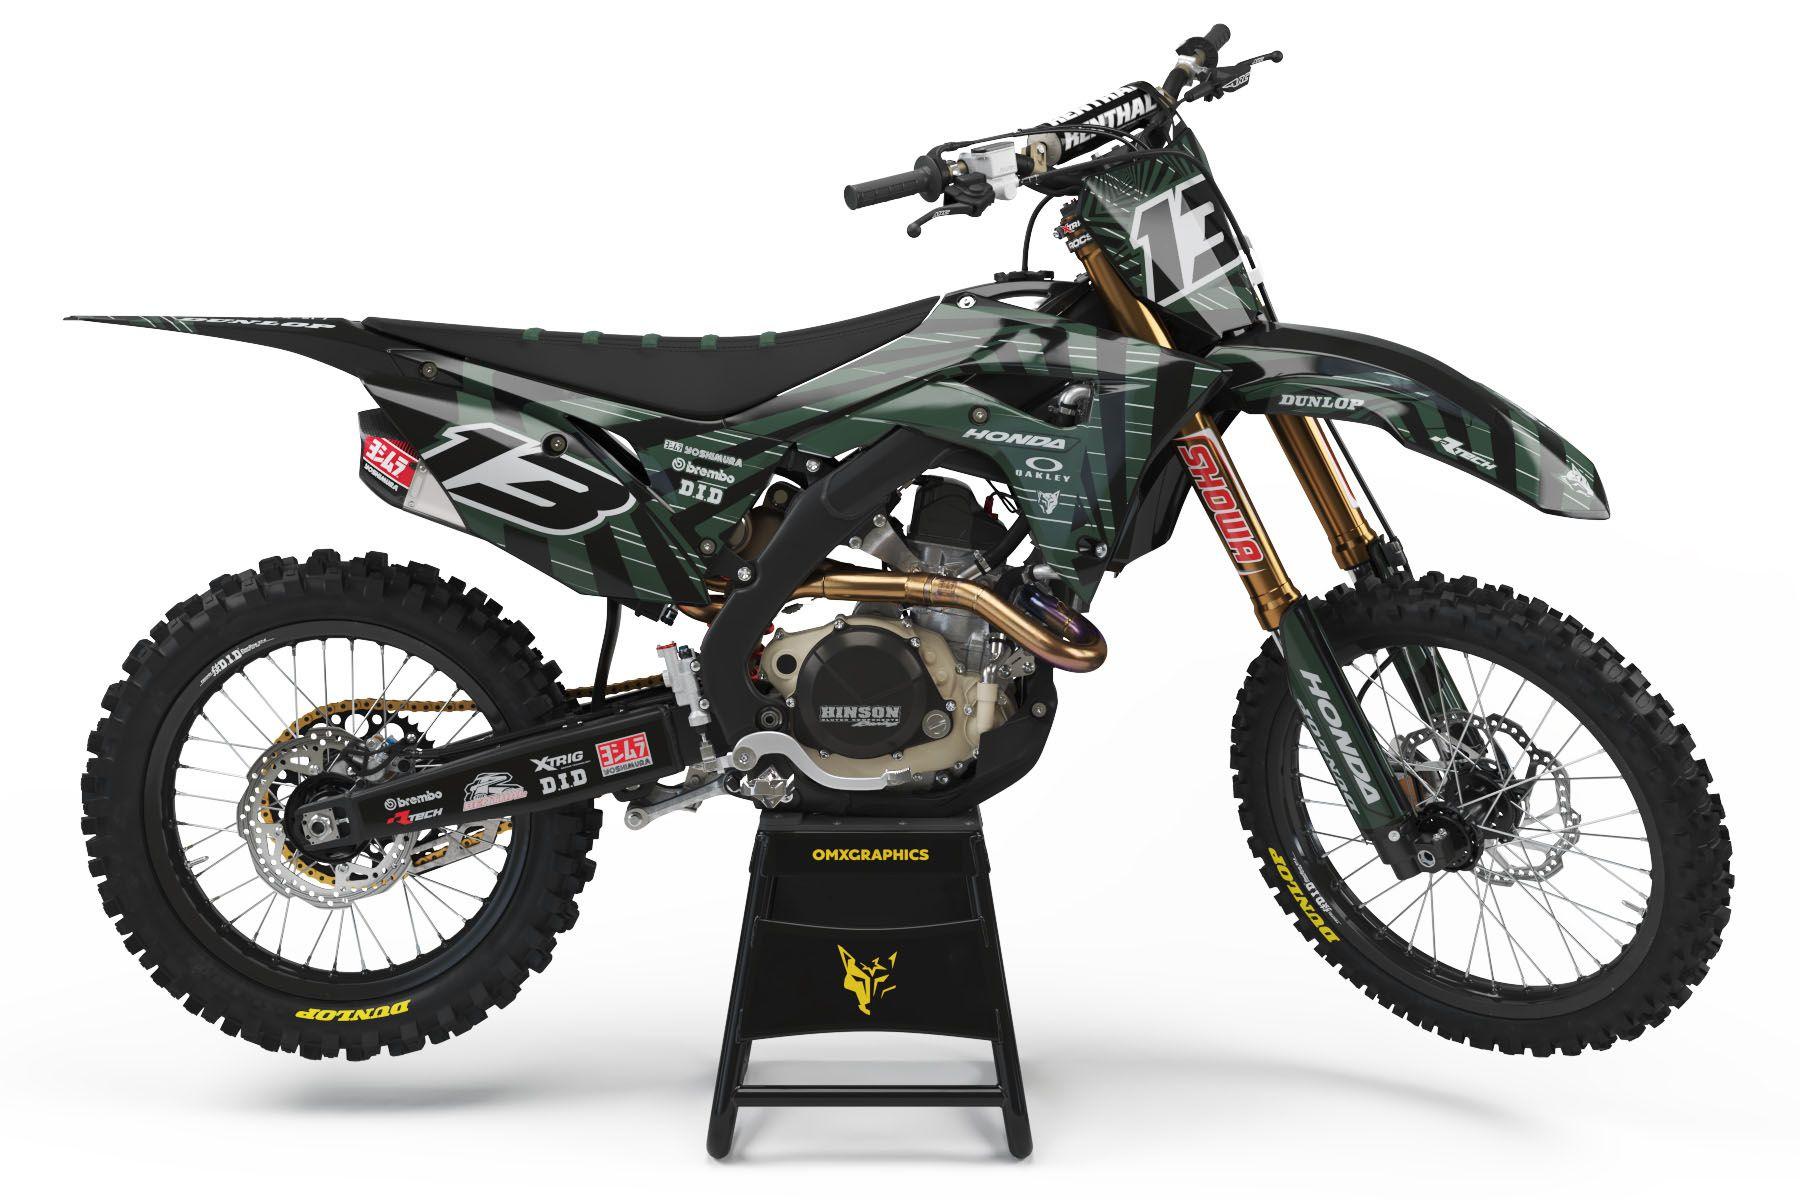 Honda Dirt Bike Graphics Blaze Army In 2020 Honda Dirt Bike Motocross Honda